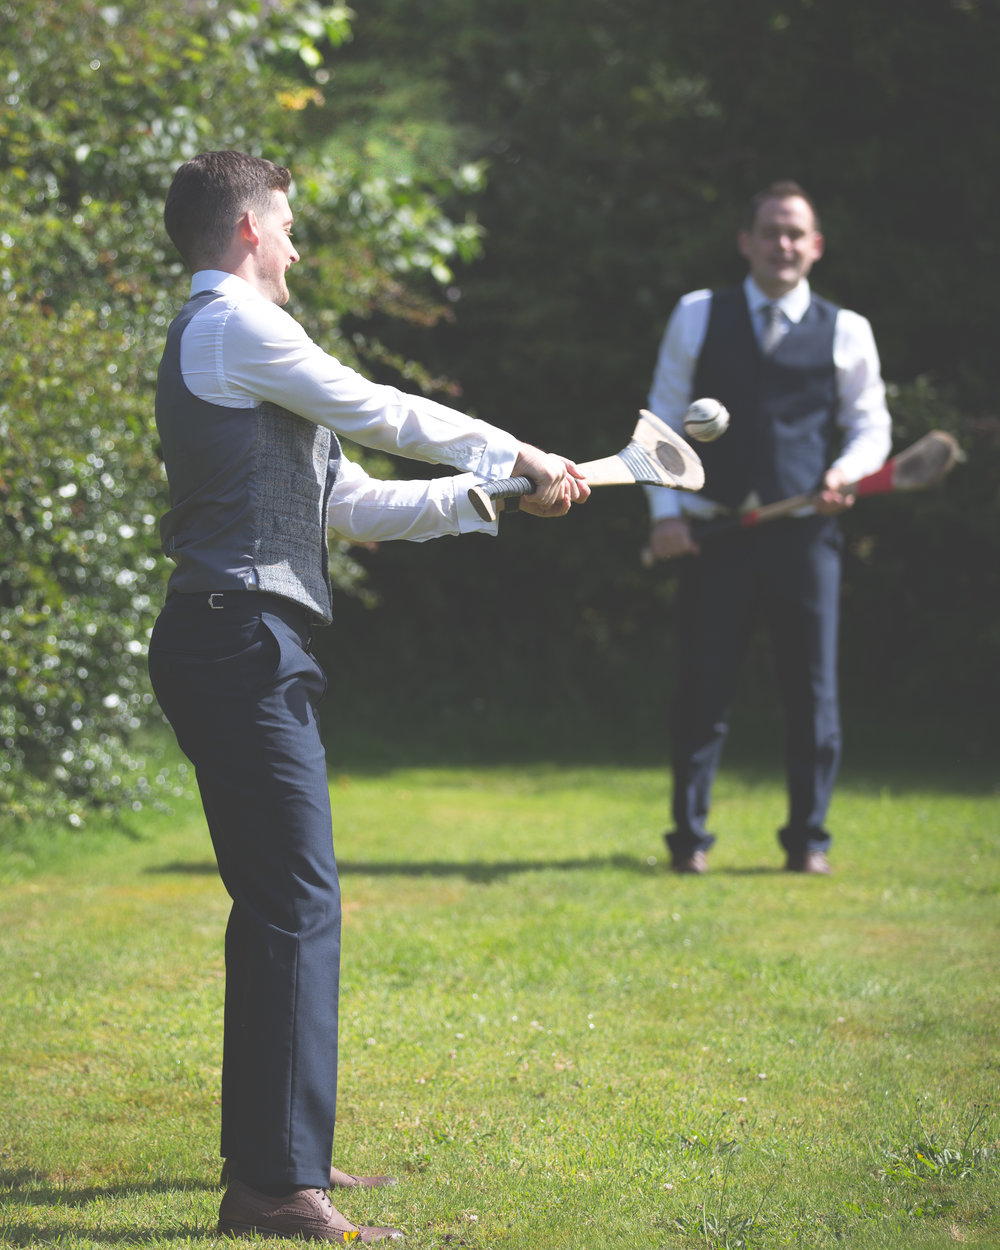 Brian McEwan Wedding Photography | Carol-Anne & Sean | Groom & Groomsmen-35.jpg